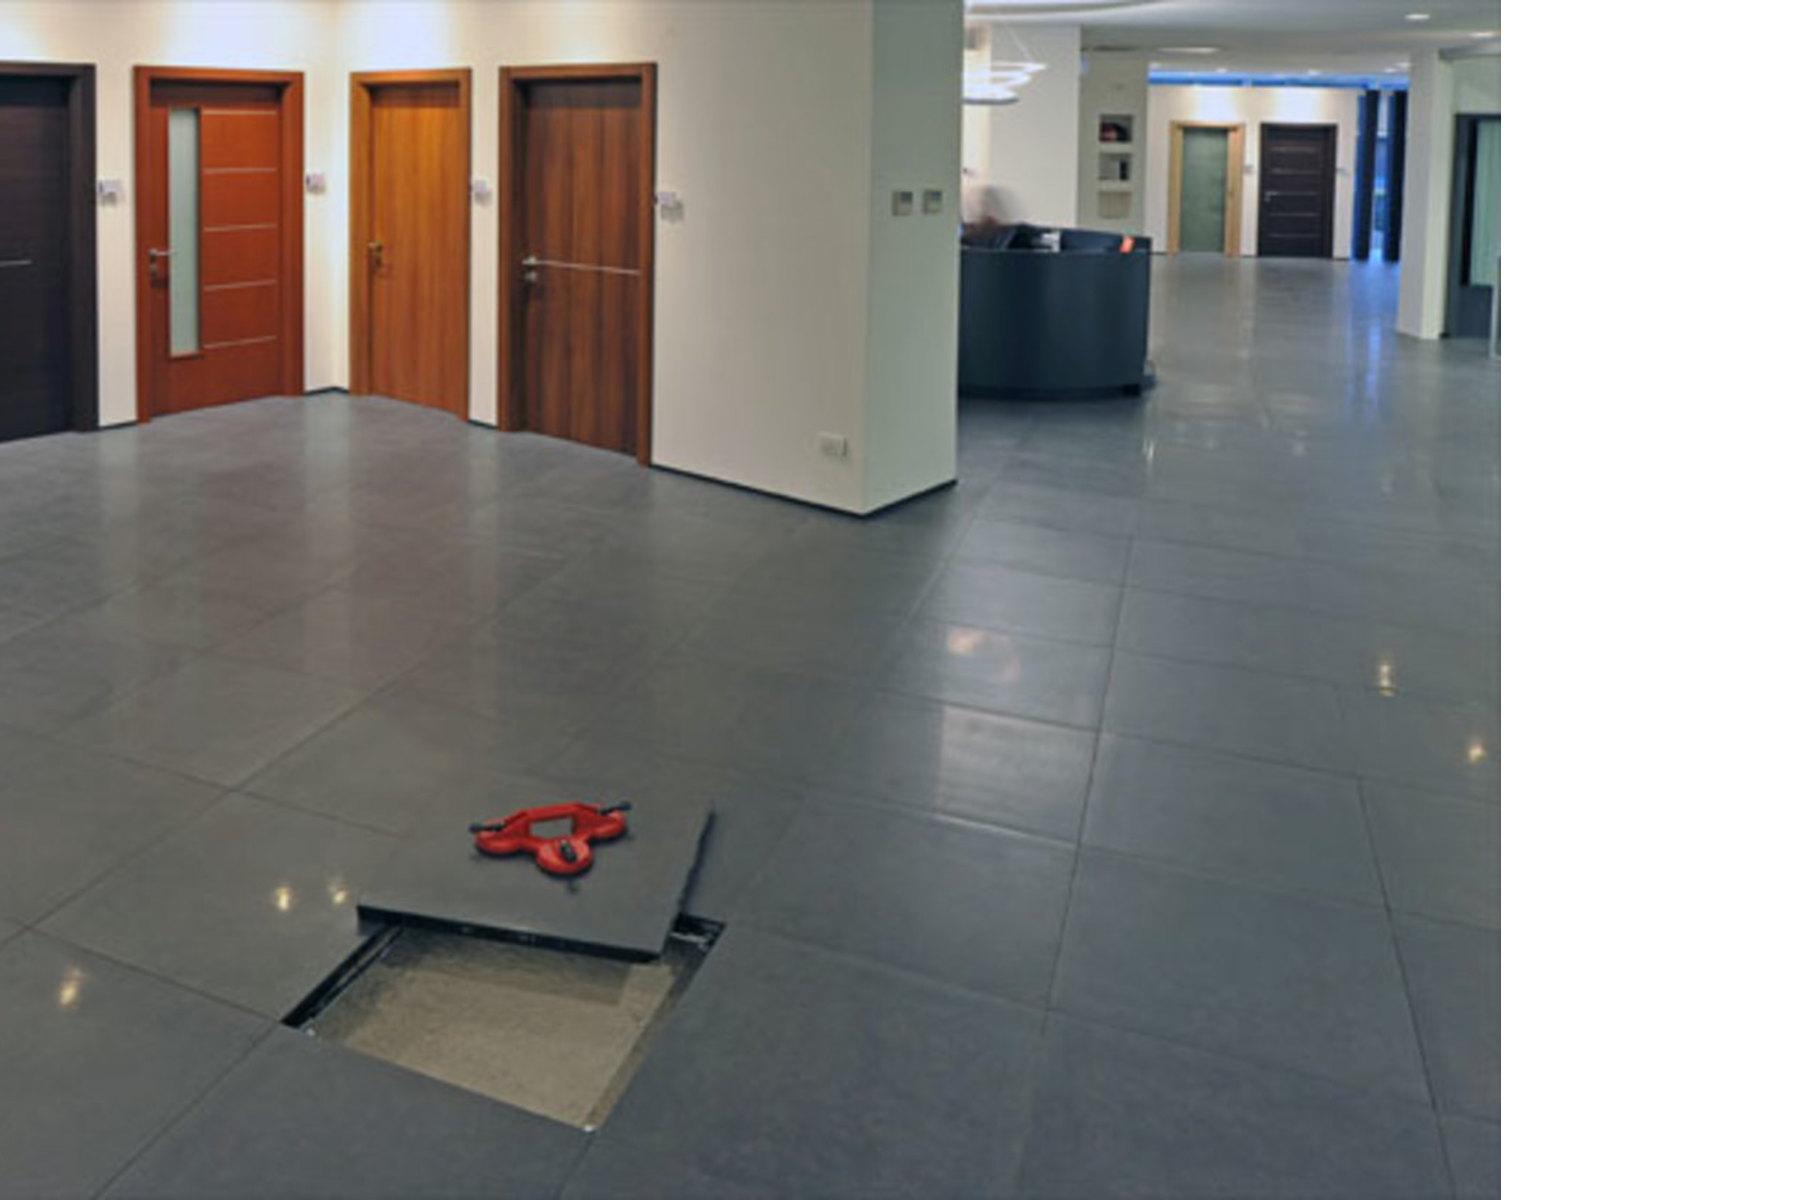 Stunning nusco porte prezzi gallery amazing house design - New design porte prezzi ...